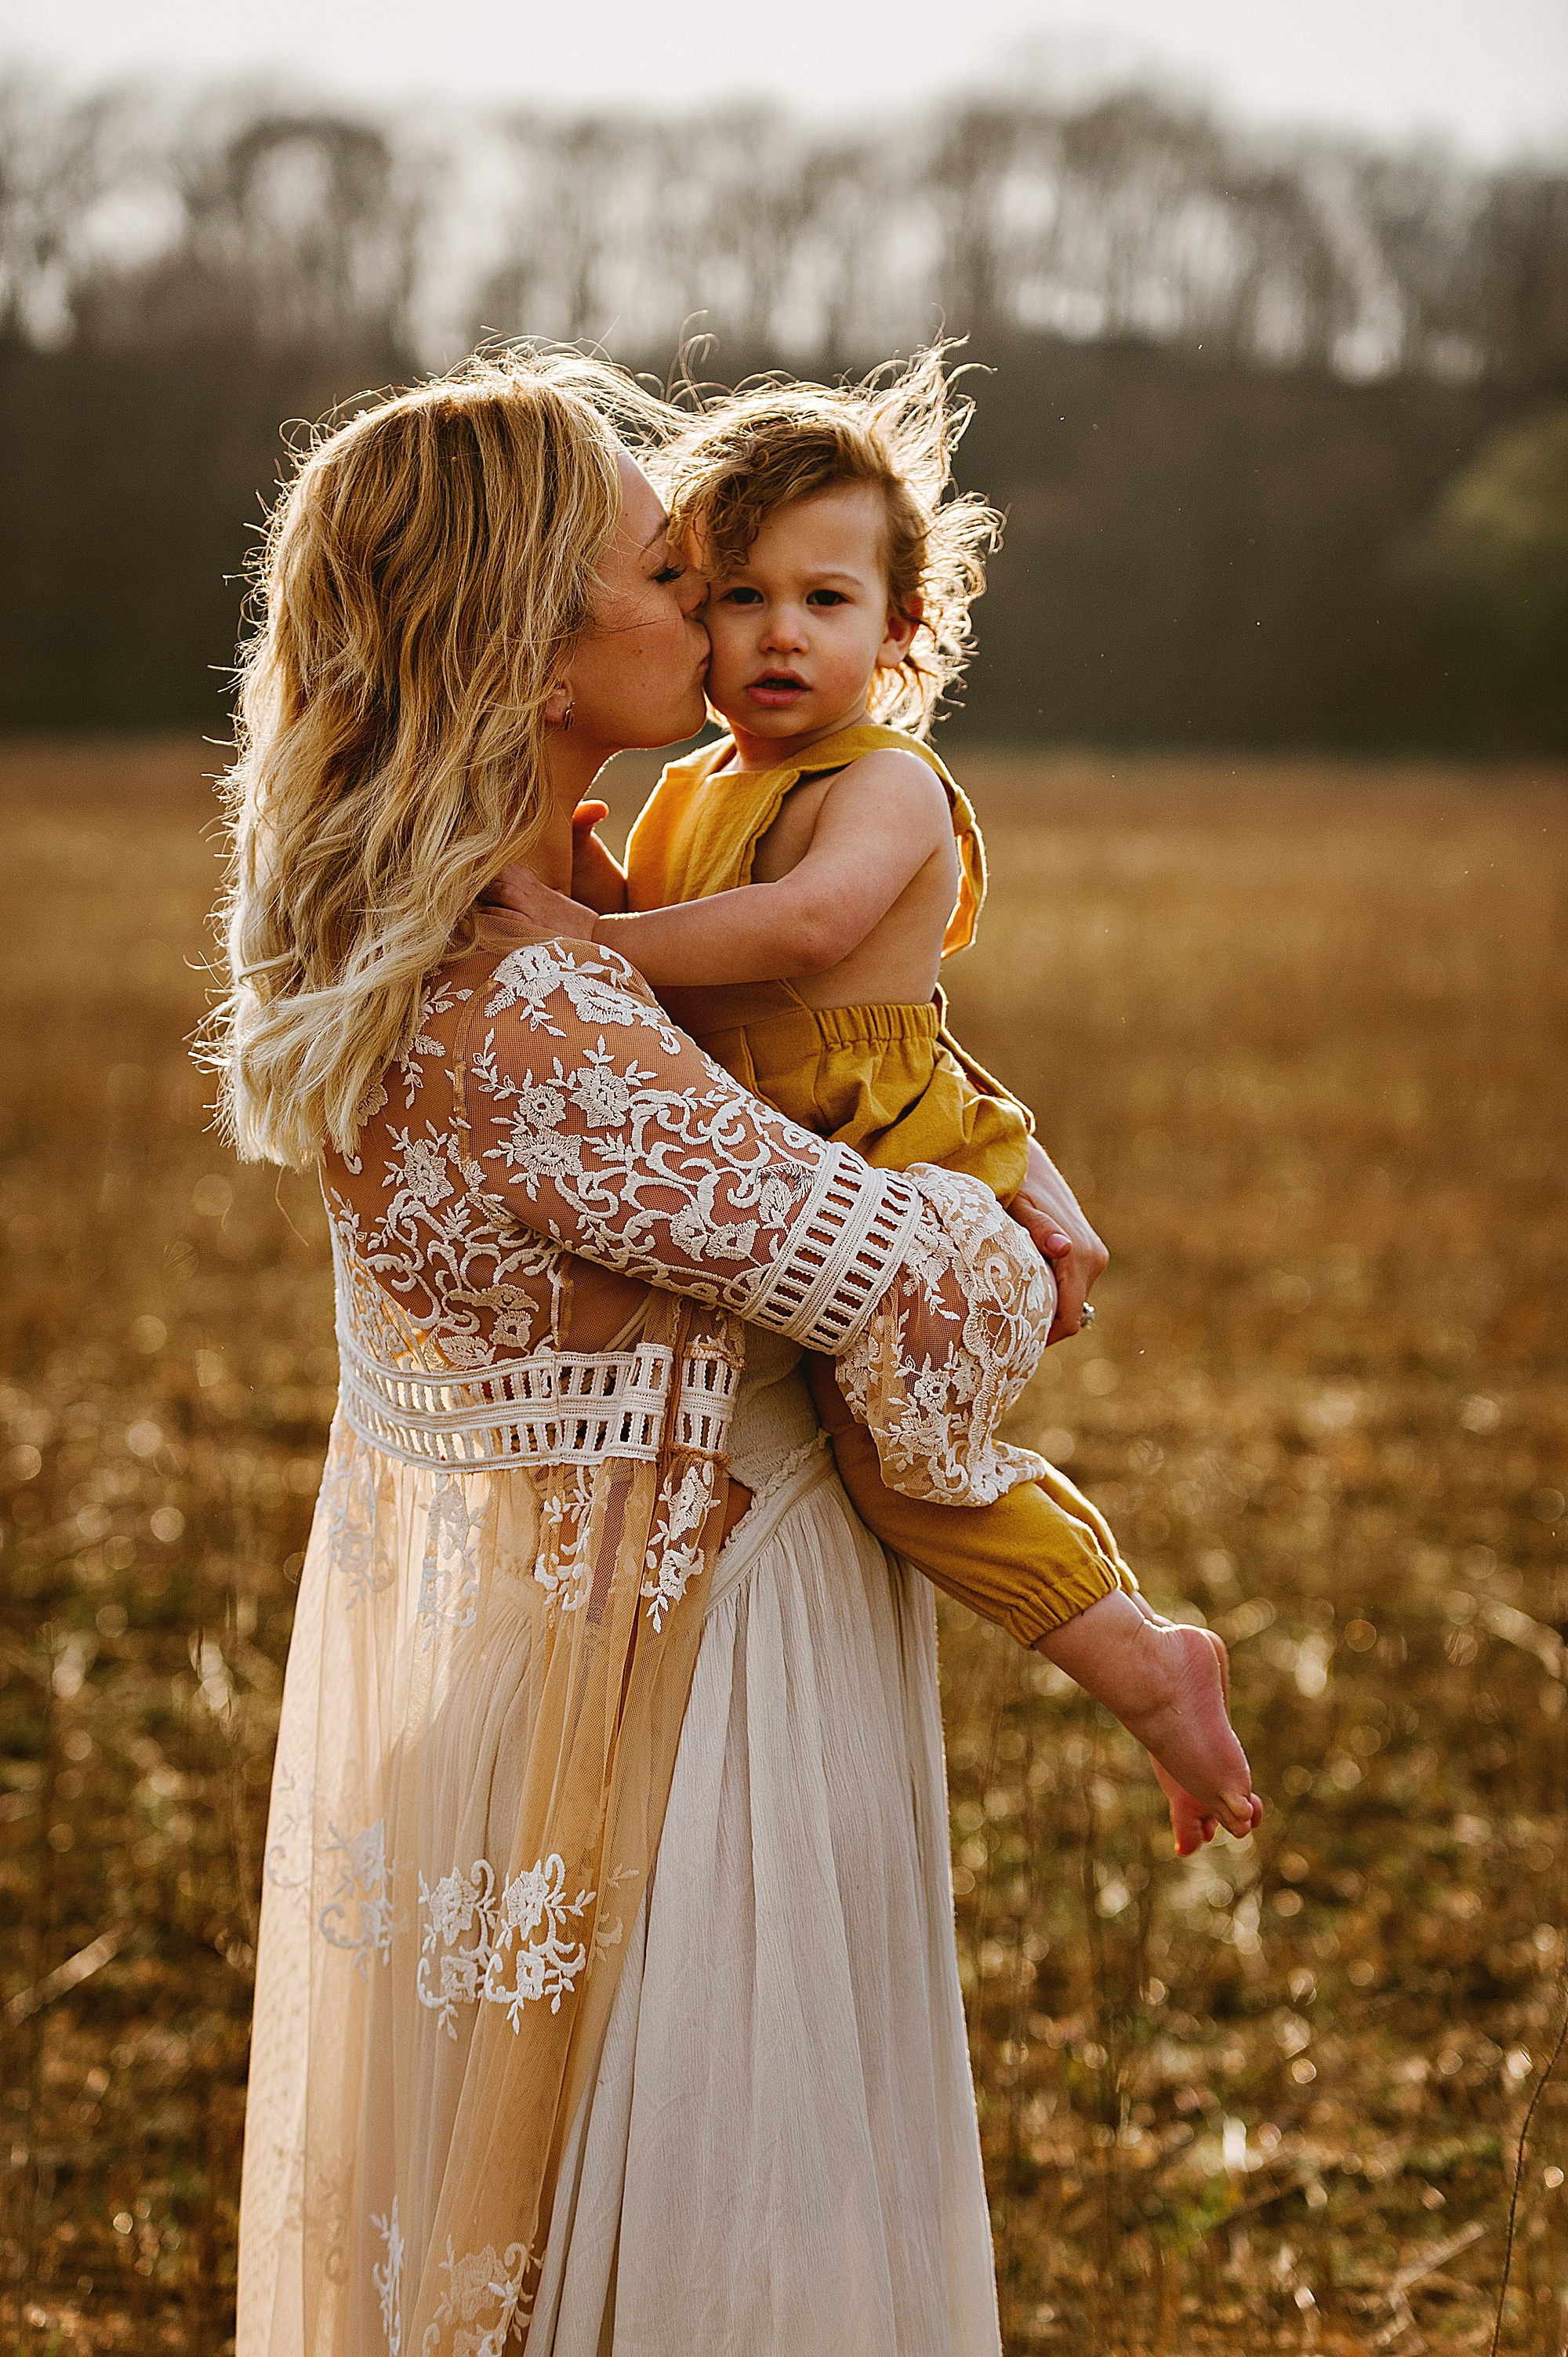 lauren-grayson-photography-akron-ohio-family-mom-boys-field-spring-outdoor-session_0008.jpg